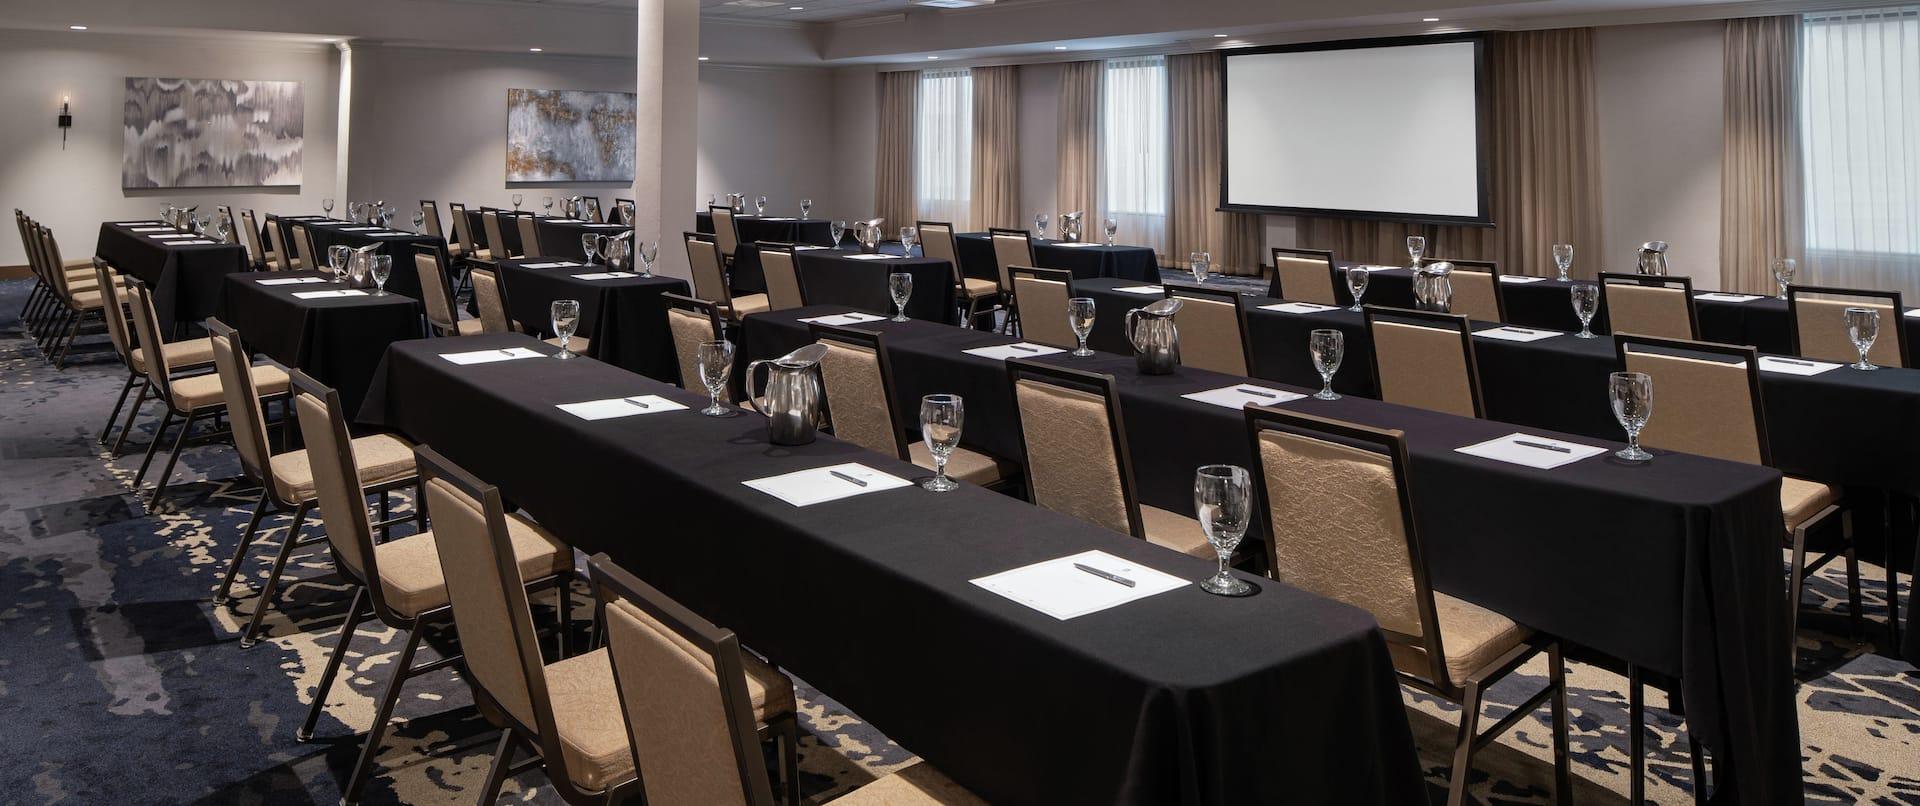 Synergy Meeting Room - Classroom set-up